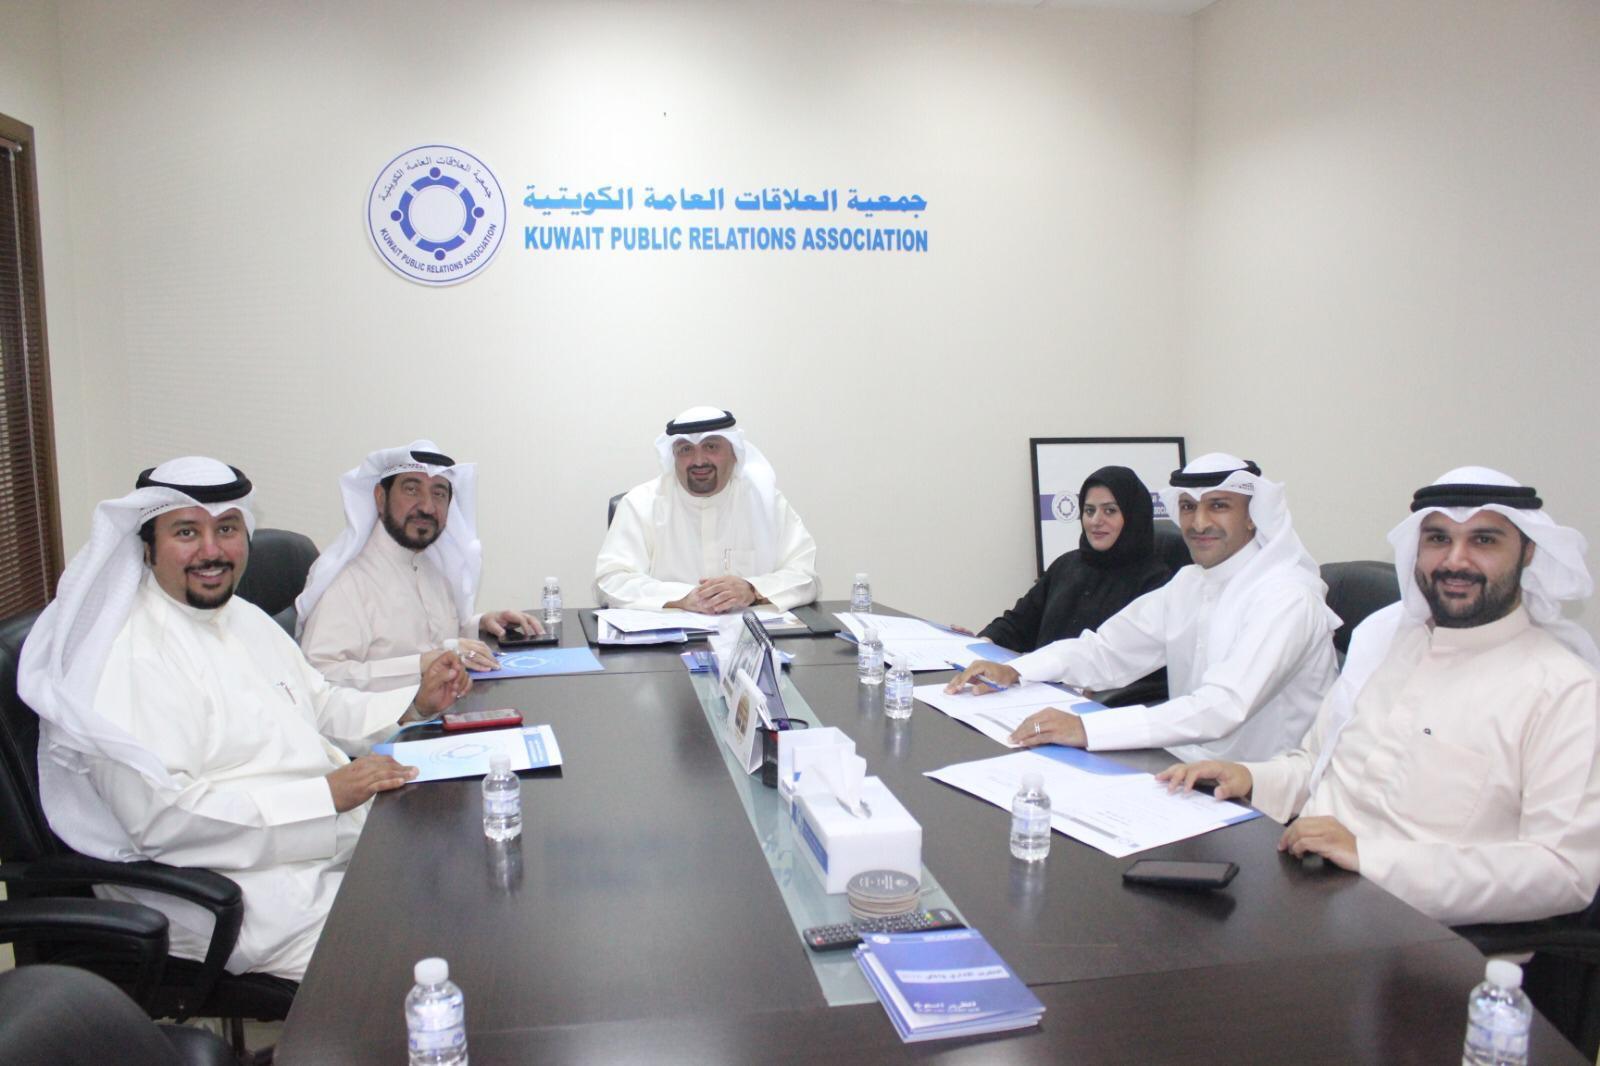 427e7453 cb06 4f9c a861 d55c47f99c62 - برعاية سامية تنطلق فعاليات جائزة الكويت للعلاقات العامة وخدمة العملاء